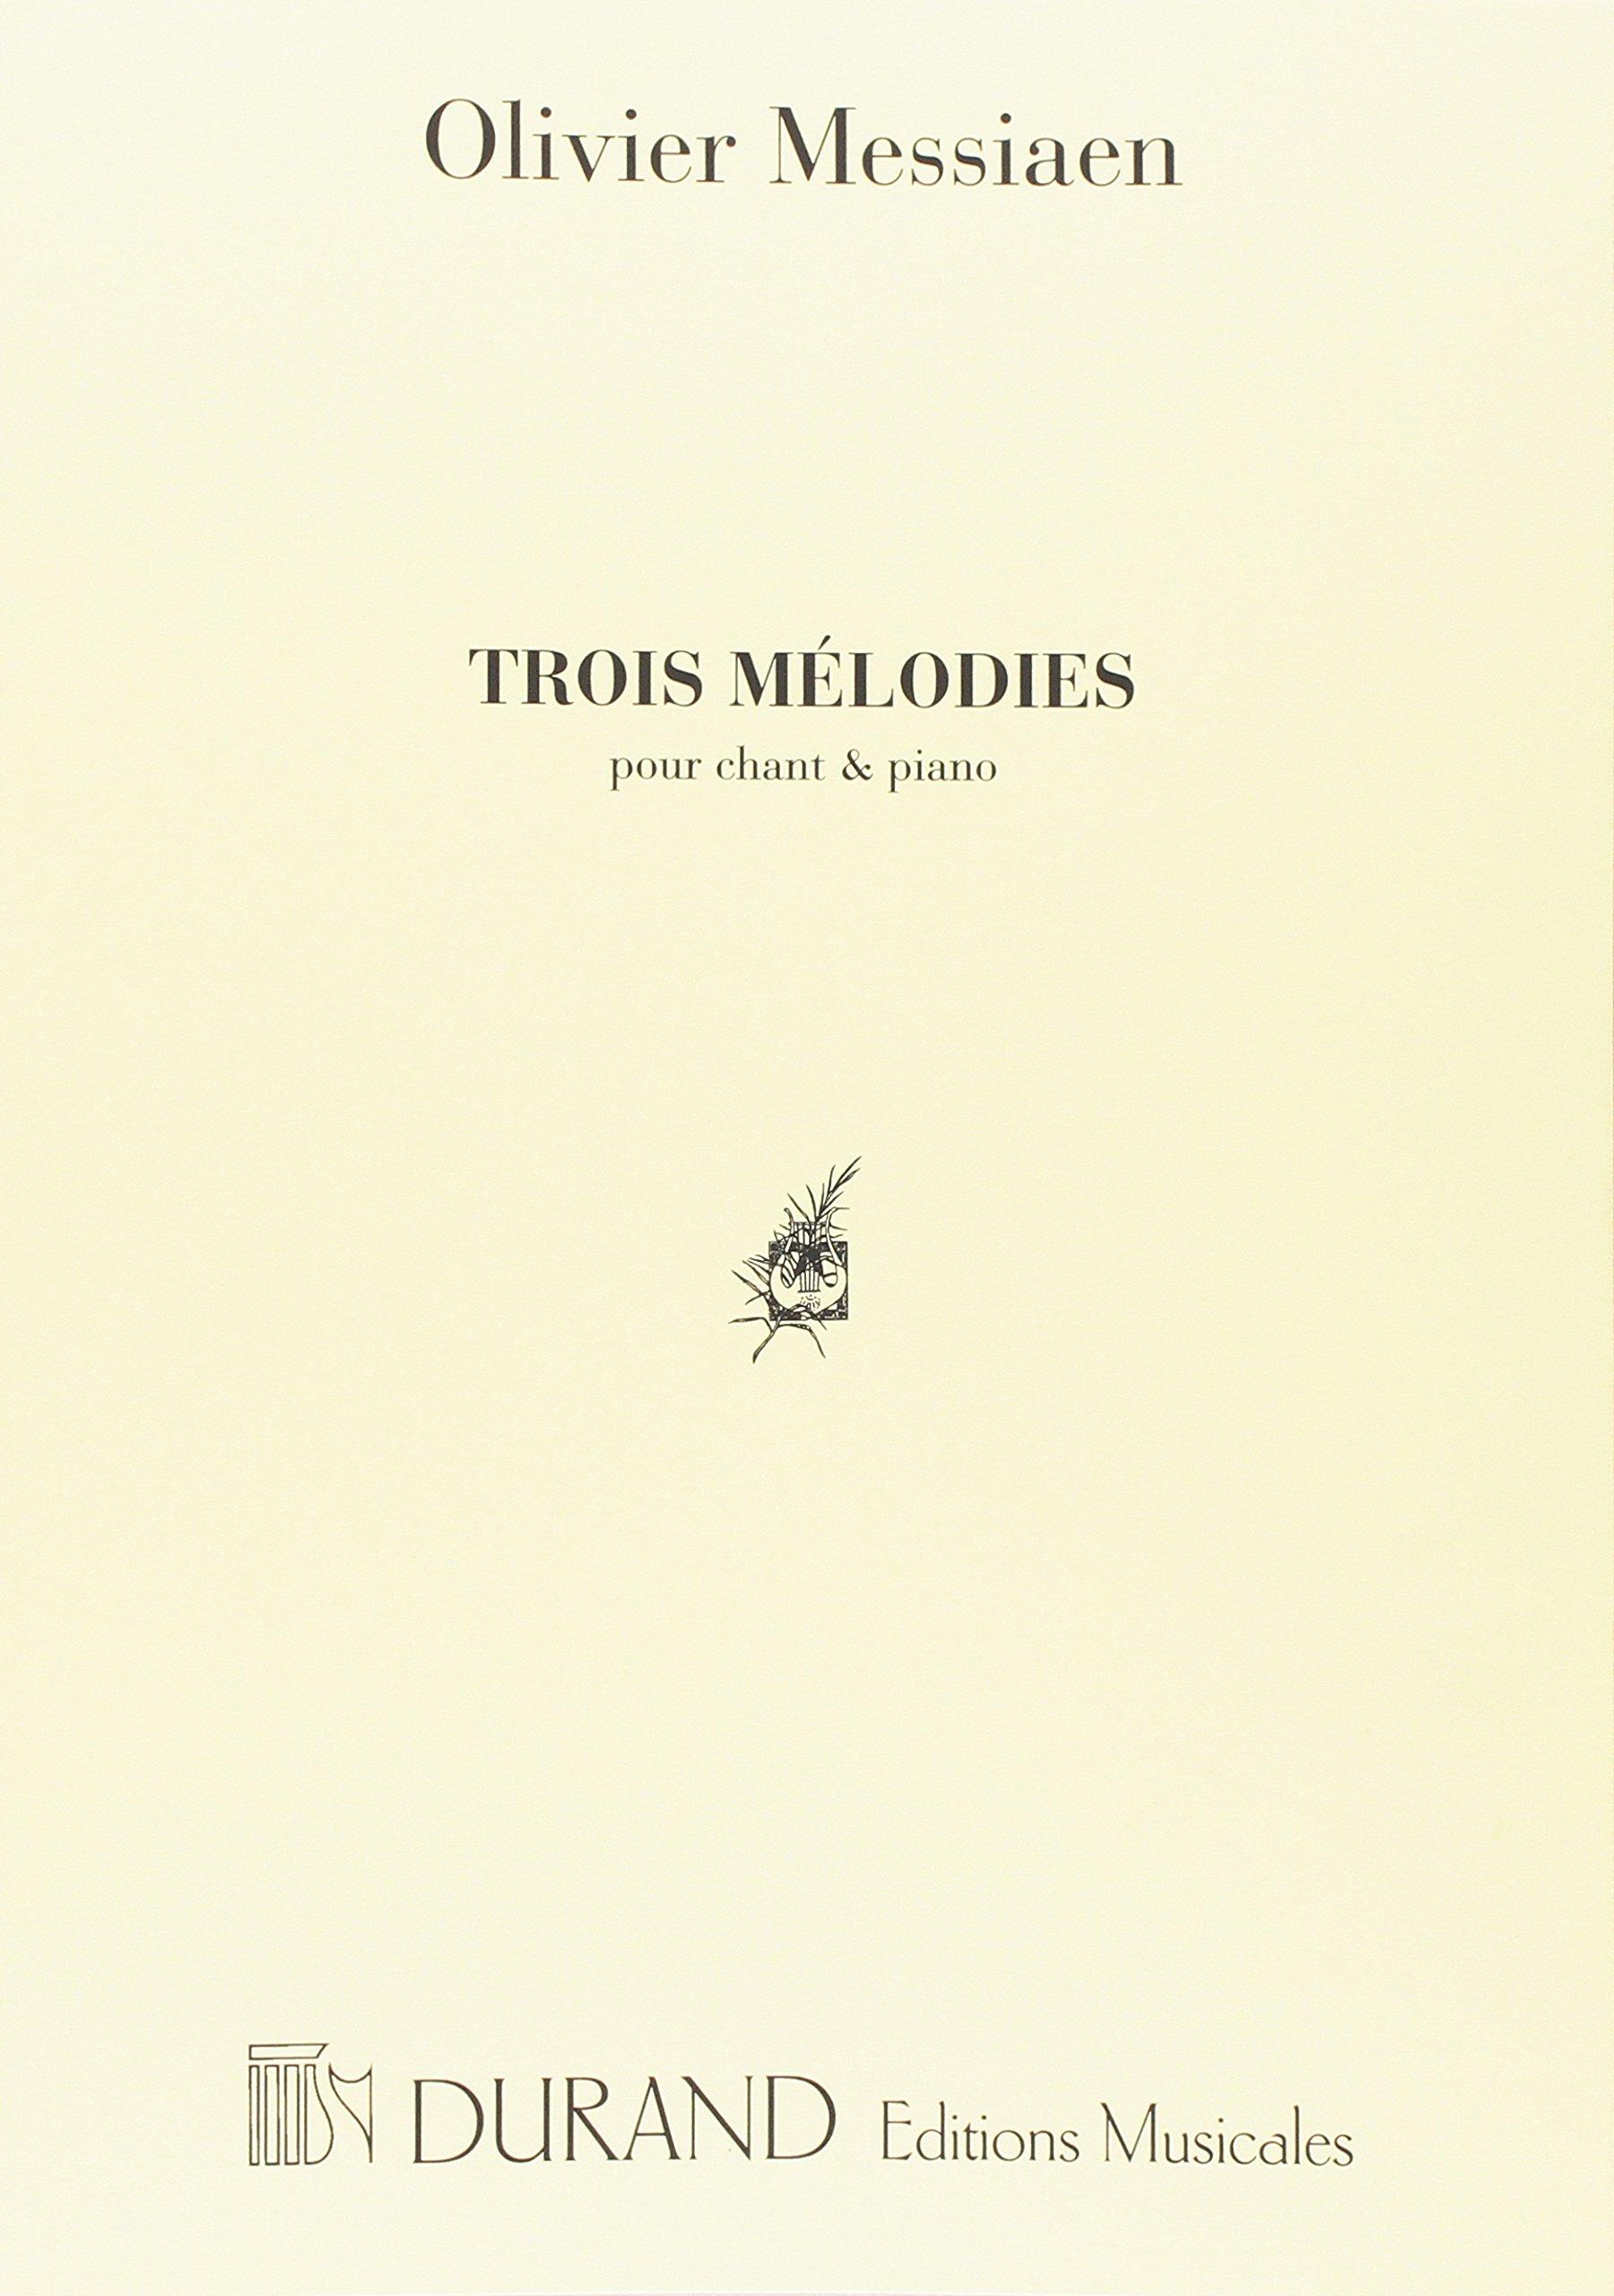 Trois Mélodies pour chant & piano (Tedesco) Copertina flessibile – 1 gen 2001 Olivier Messiaen Durand 004405100X 94505